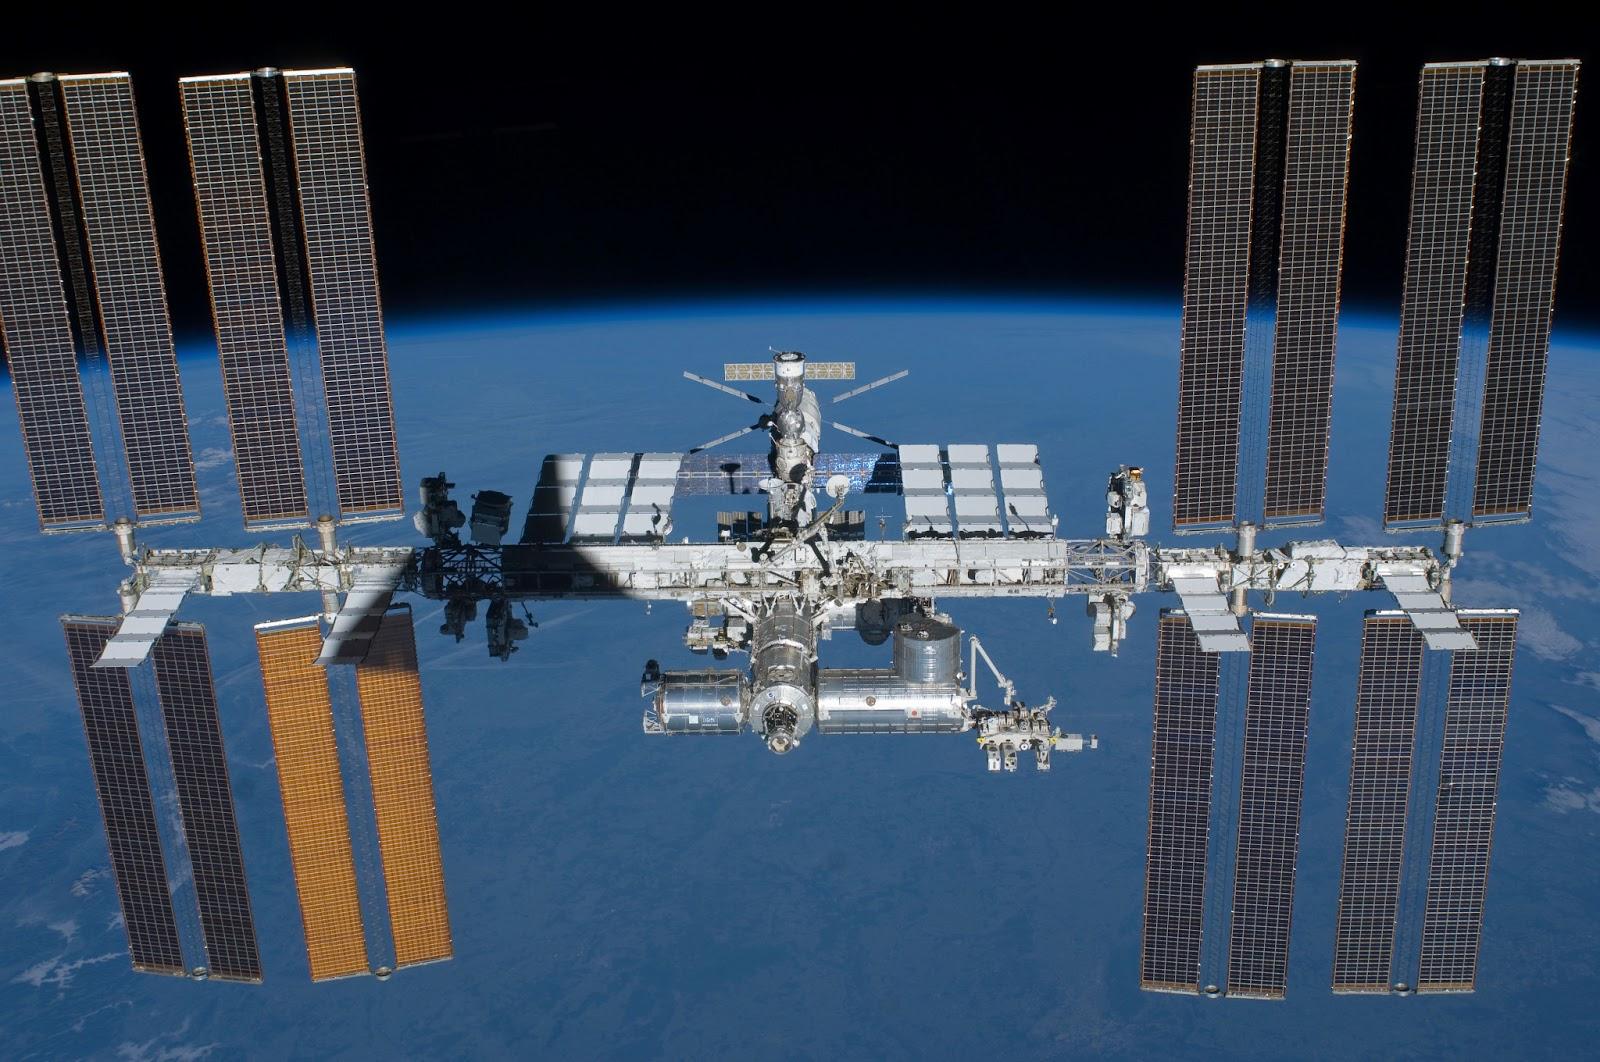 Orbiter.ch Space News: 2013-05-12